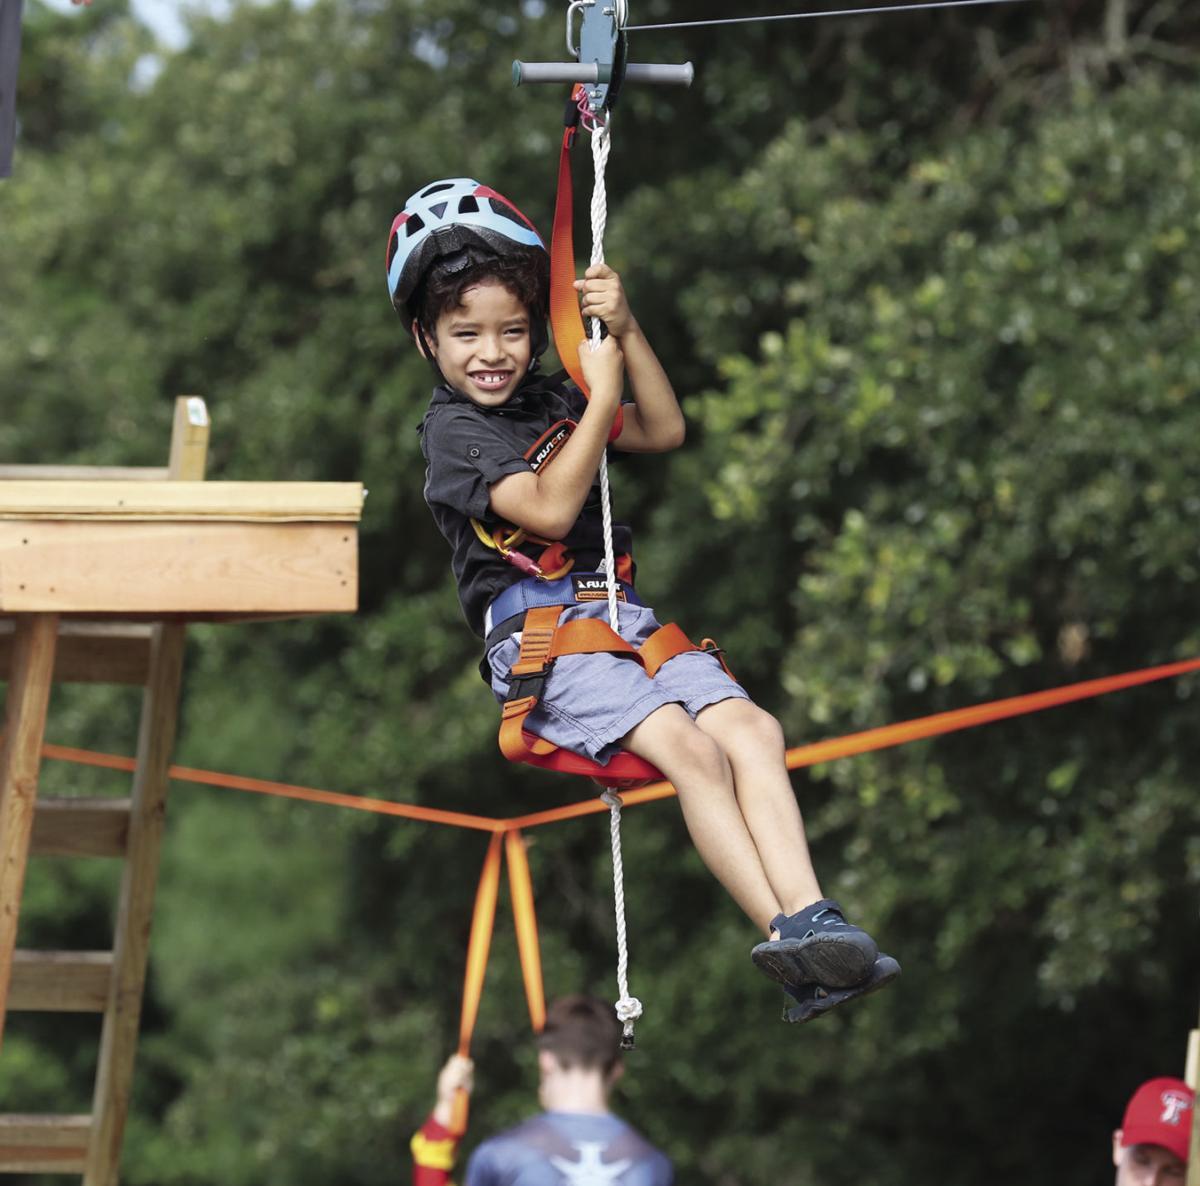 Ziplining on tap at VBS